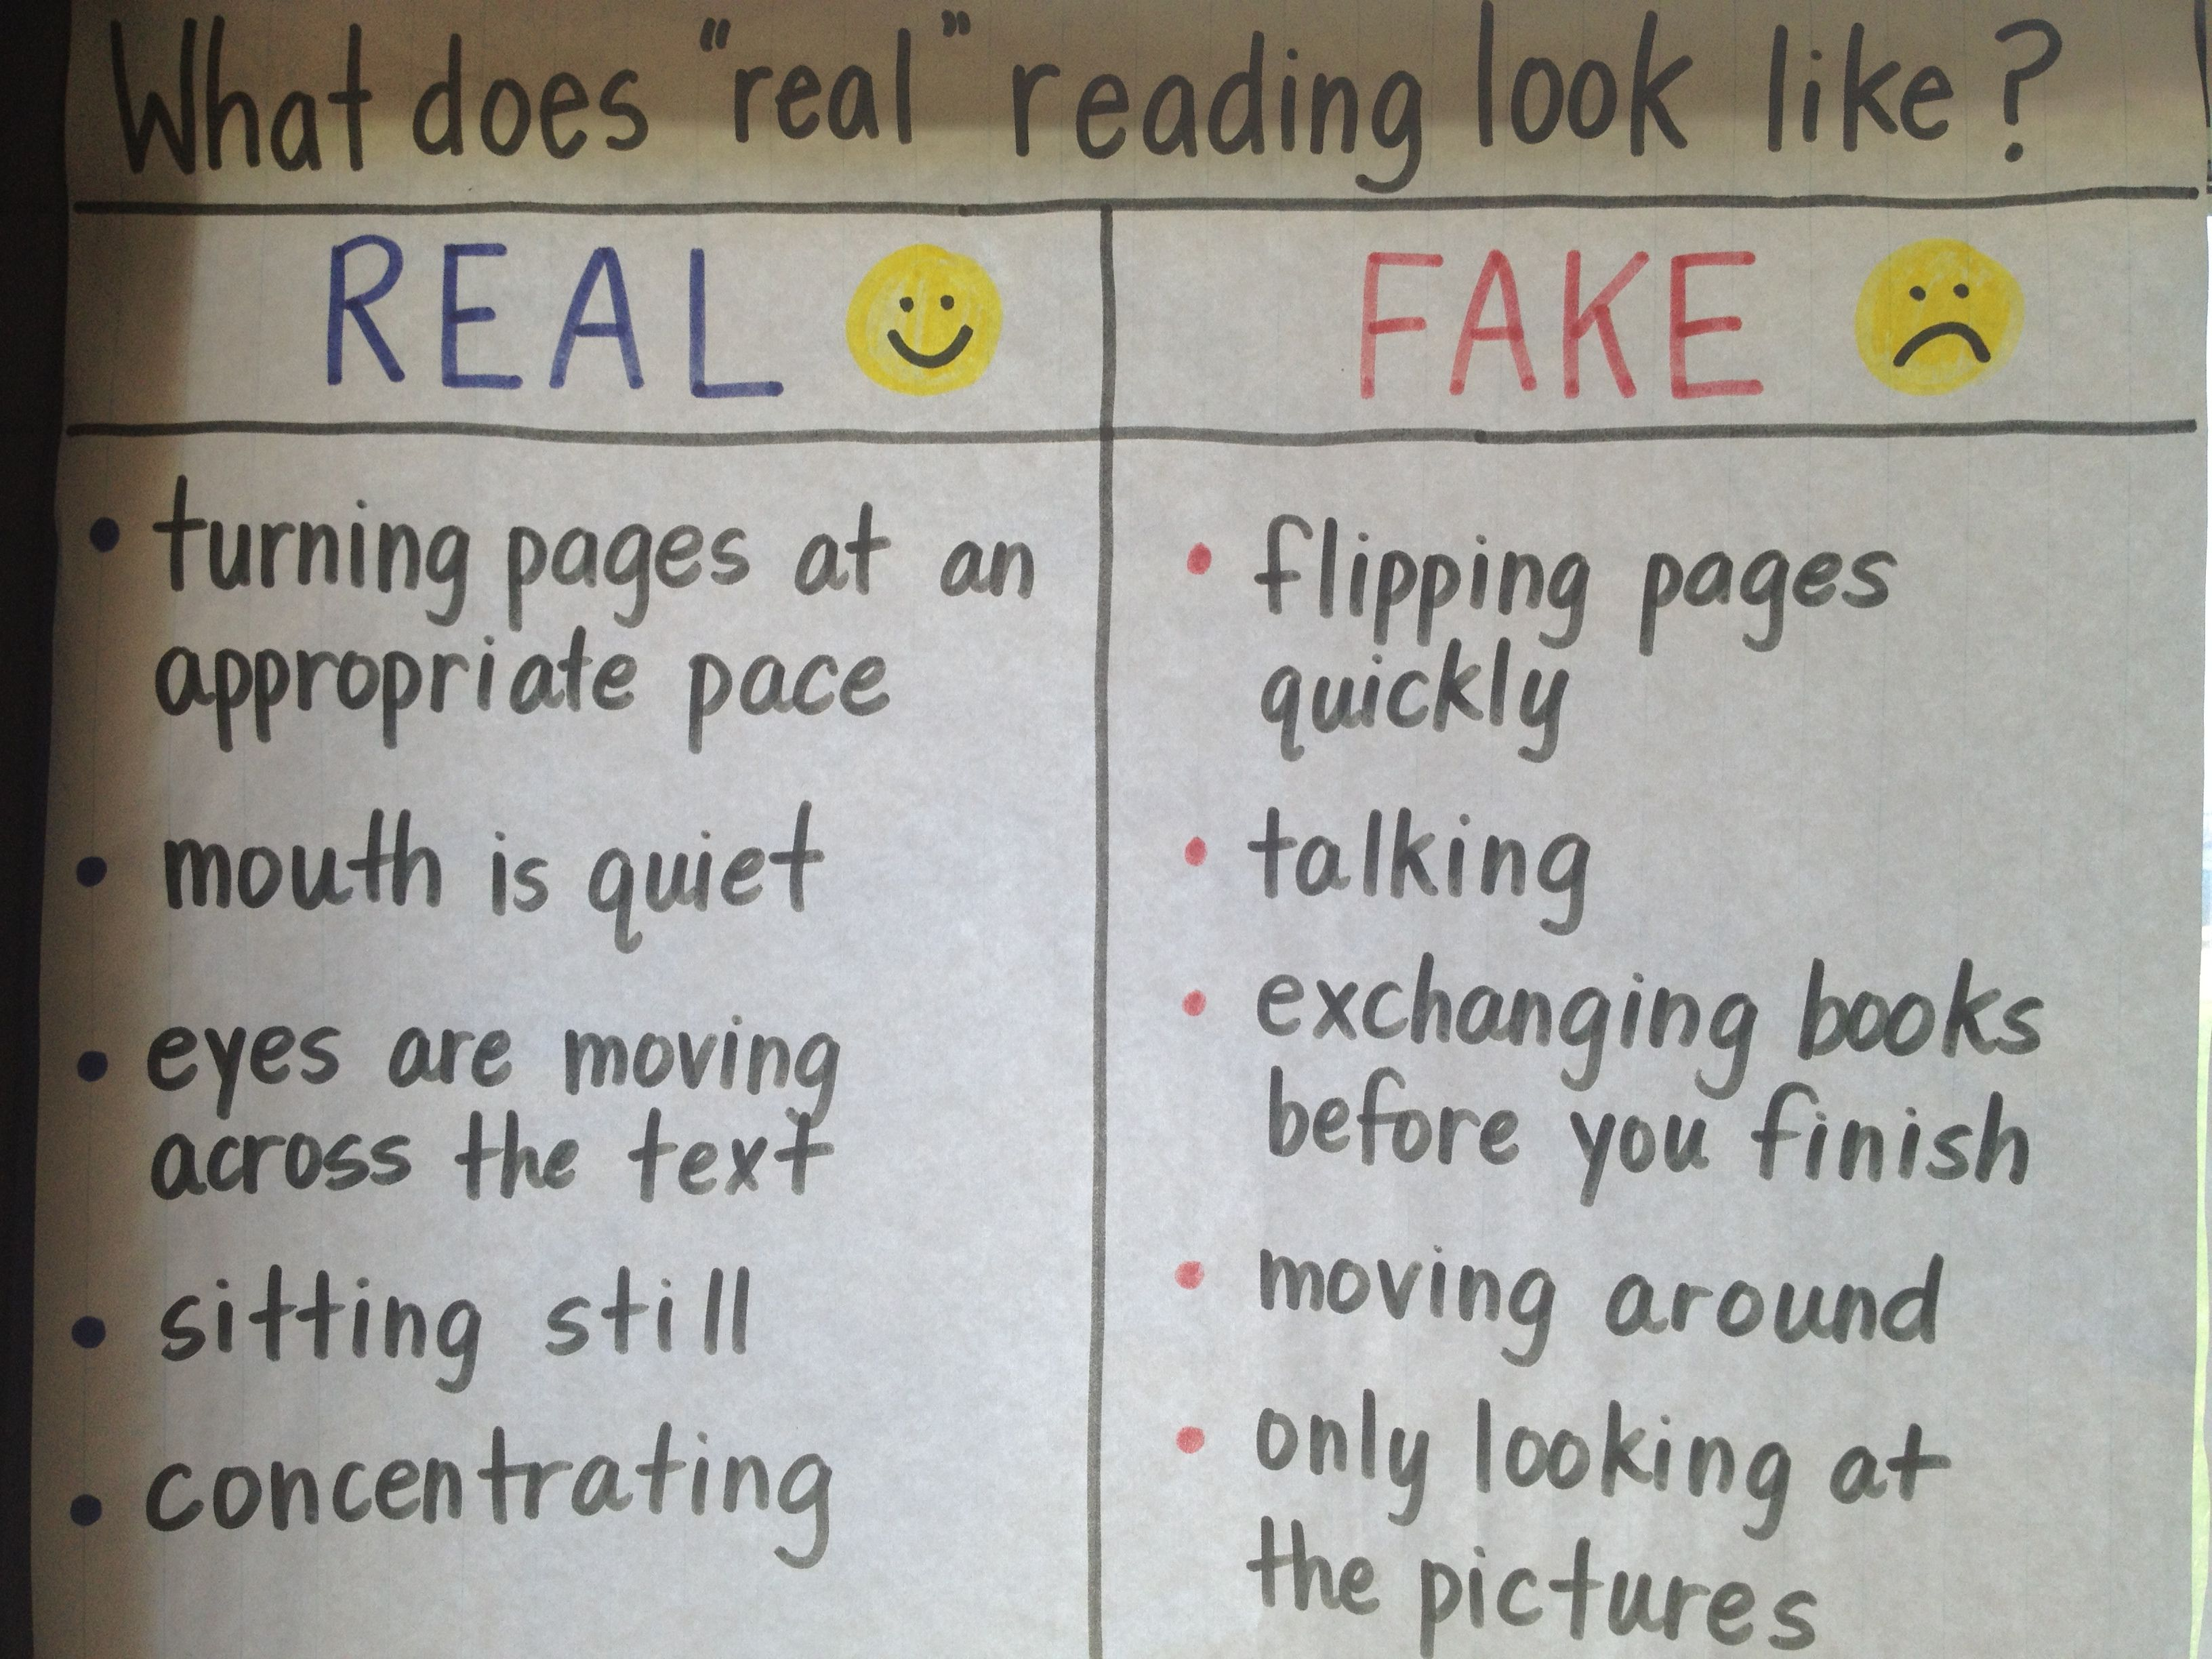 Real Reading Vs Fake Reading